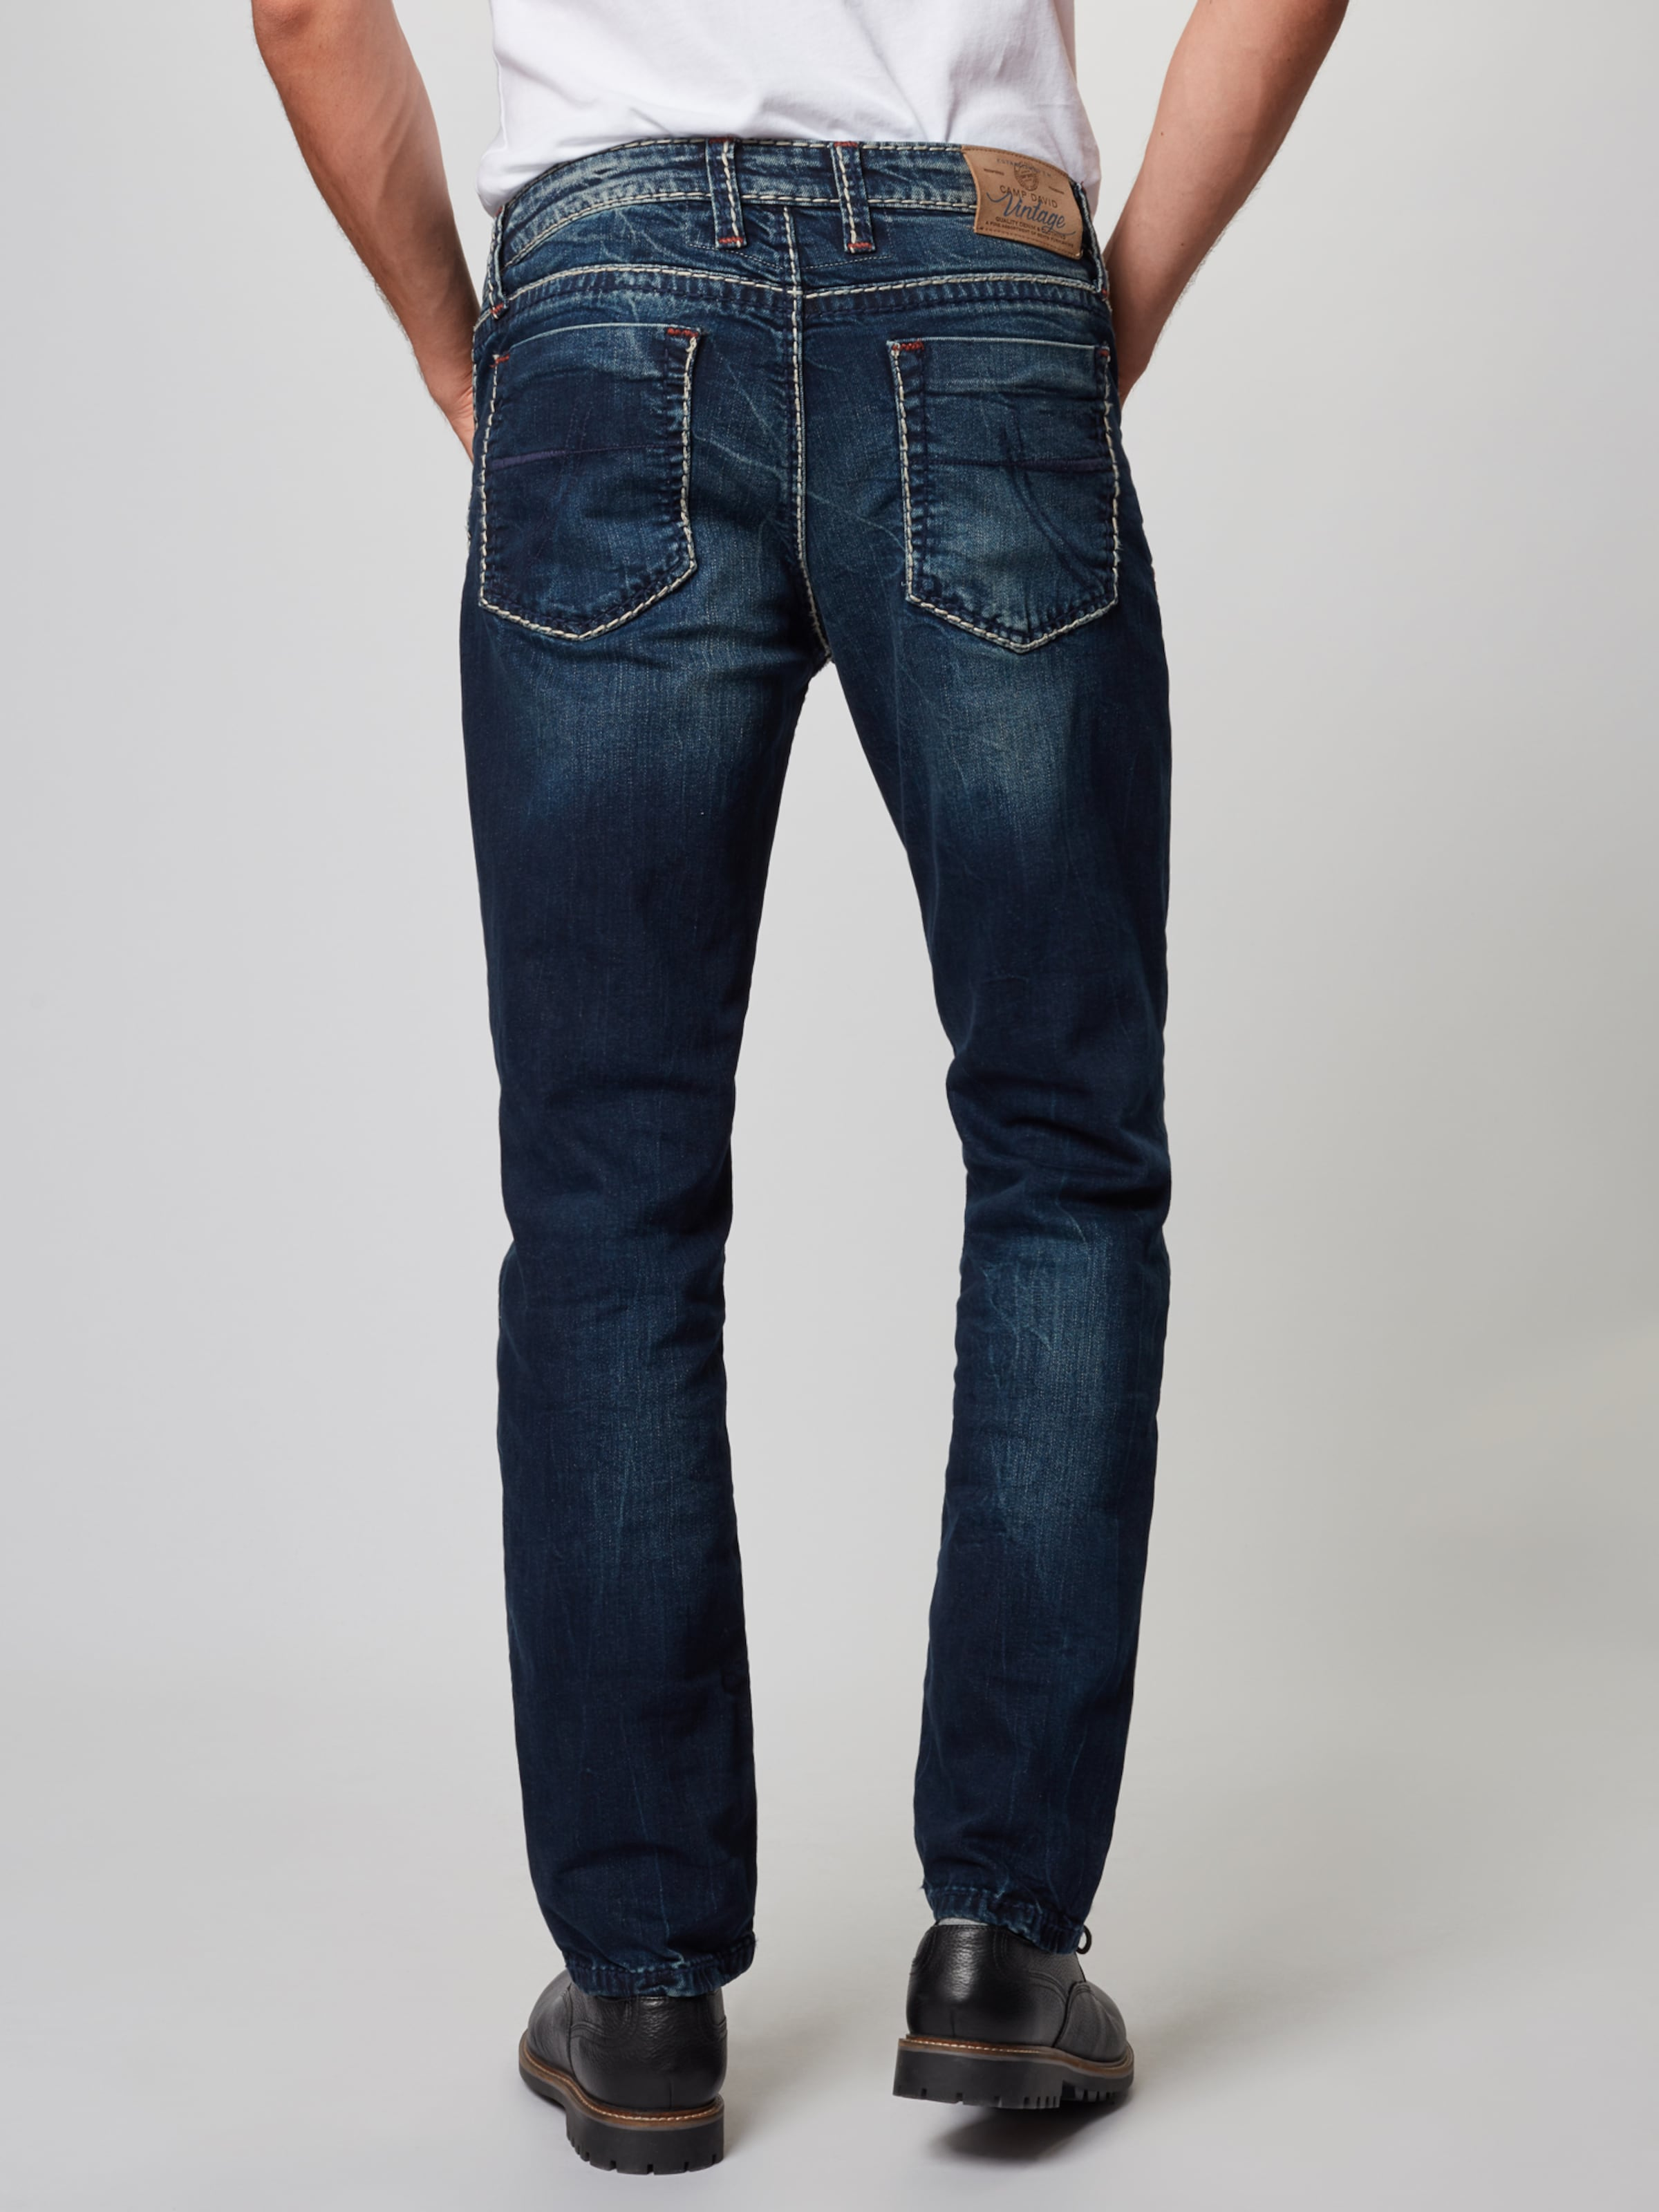 David Camp Dunkelblau Jeans r611' In co 'ni BQCxsdthr